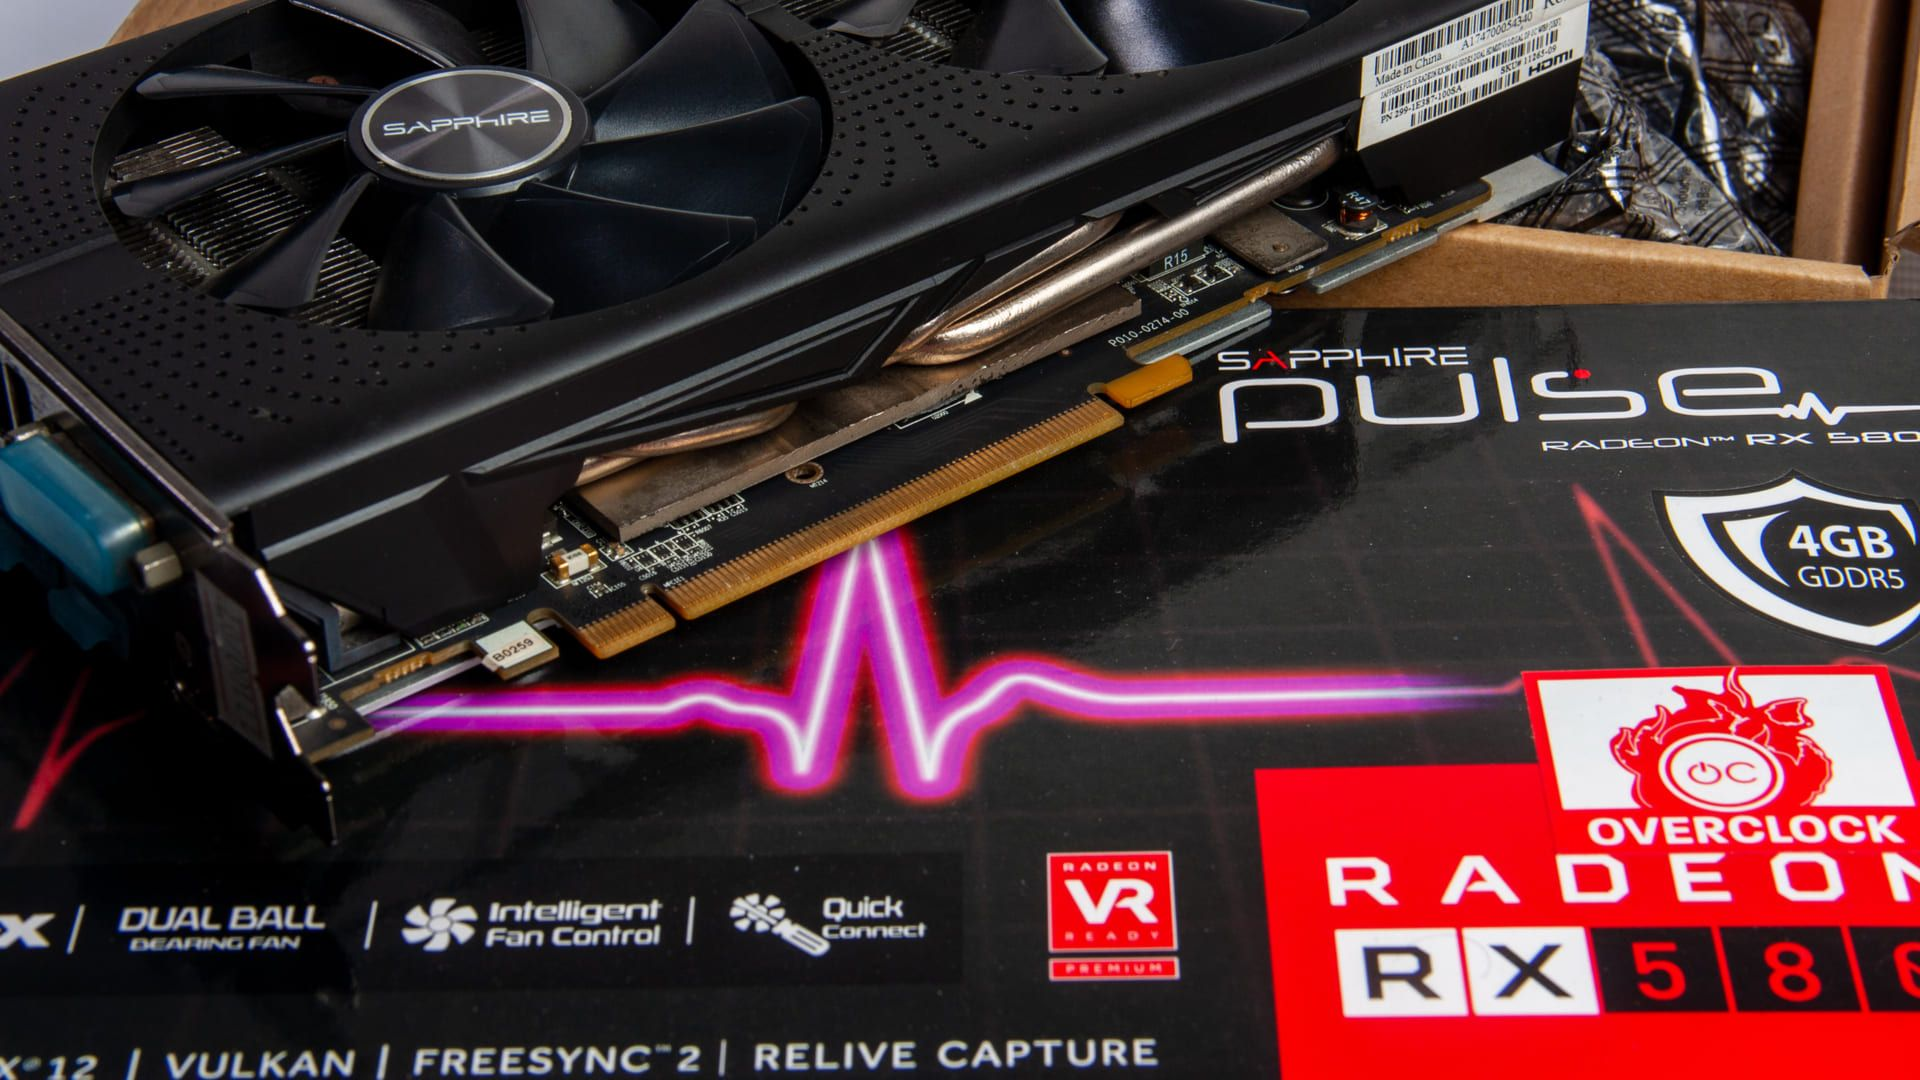 Radeon RX 580 é uma placa de vídeo intermediária potente (Foto: Shutterstock/CHALERMPHON SRISANG)